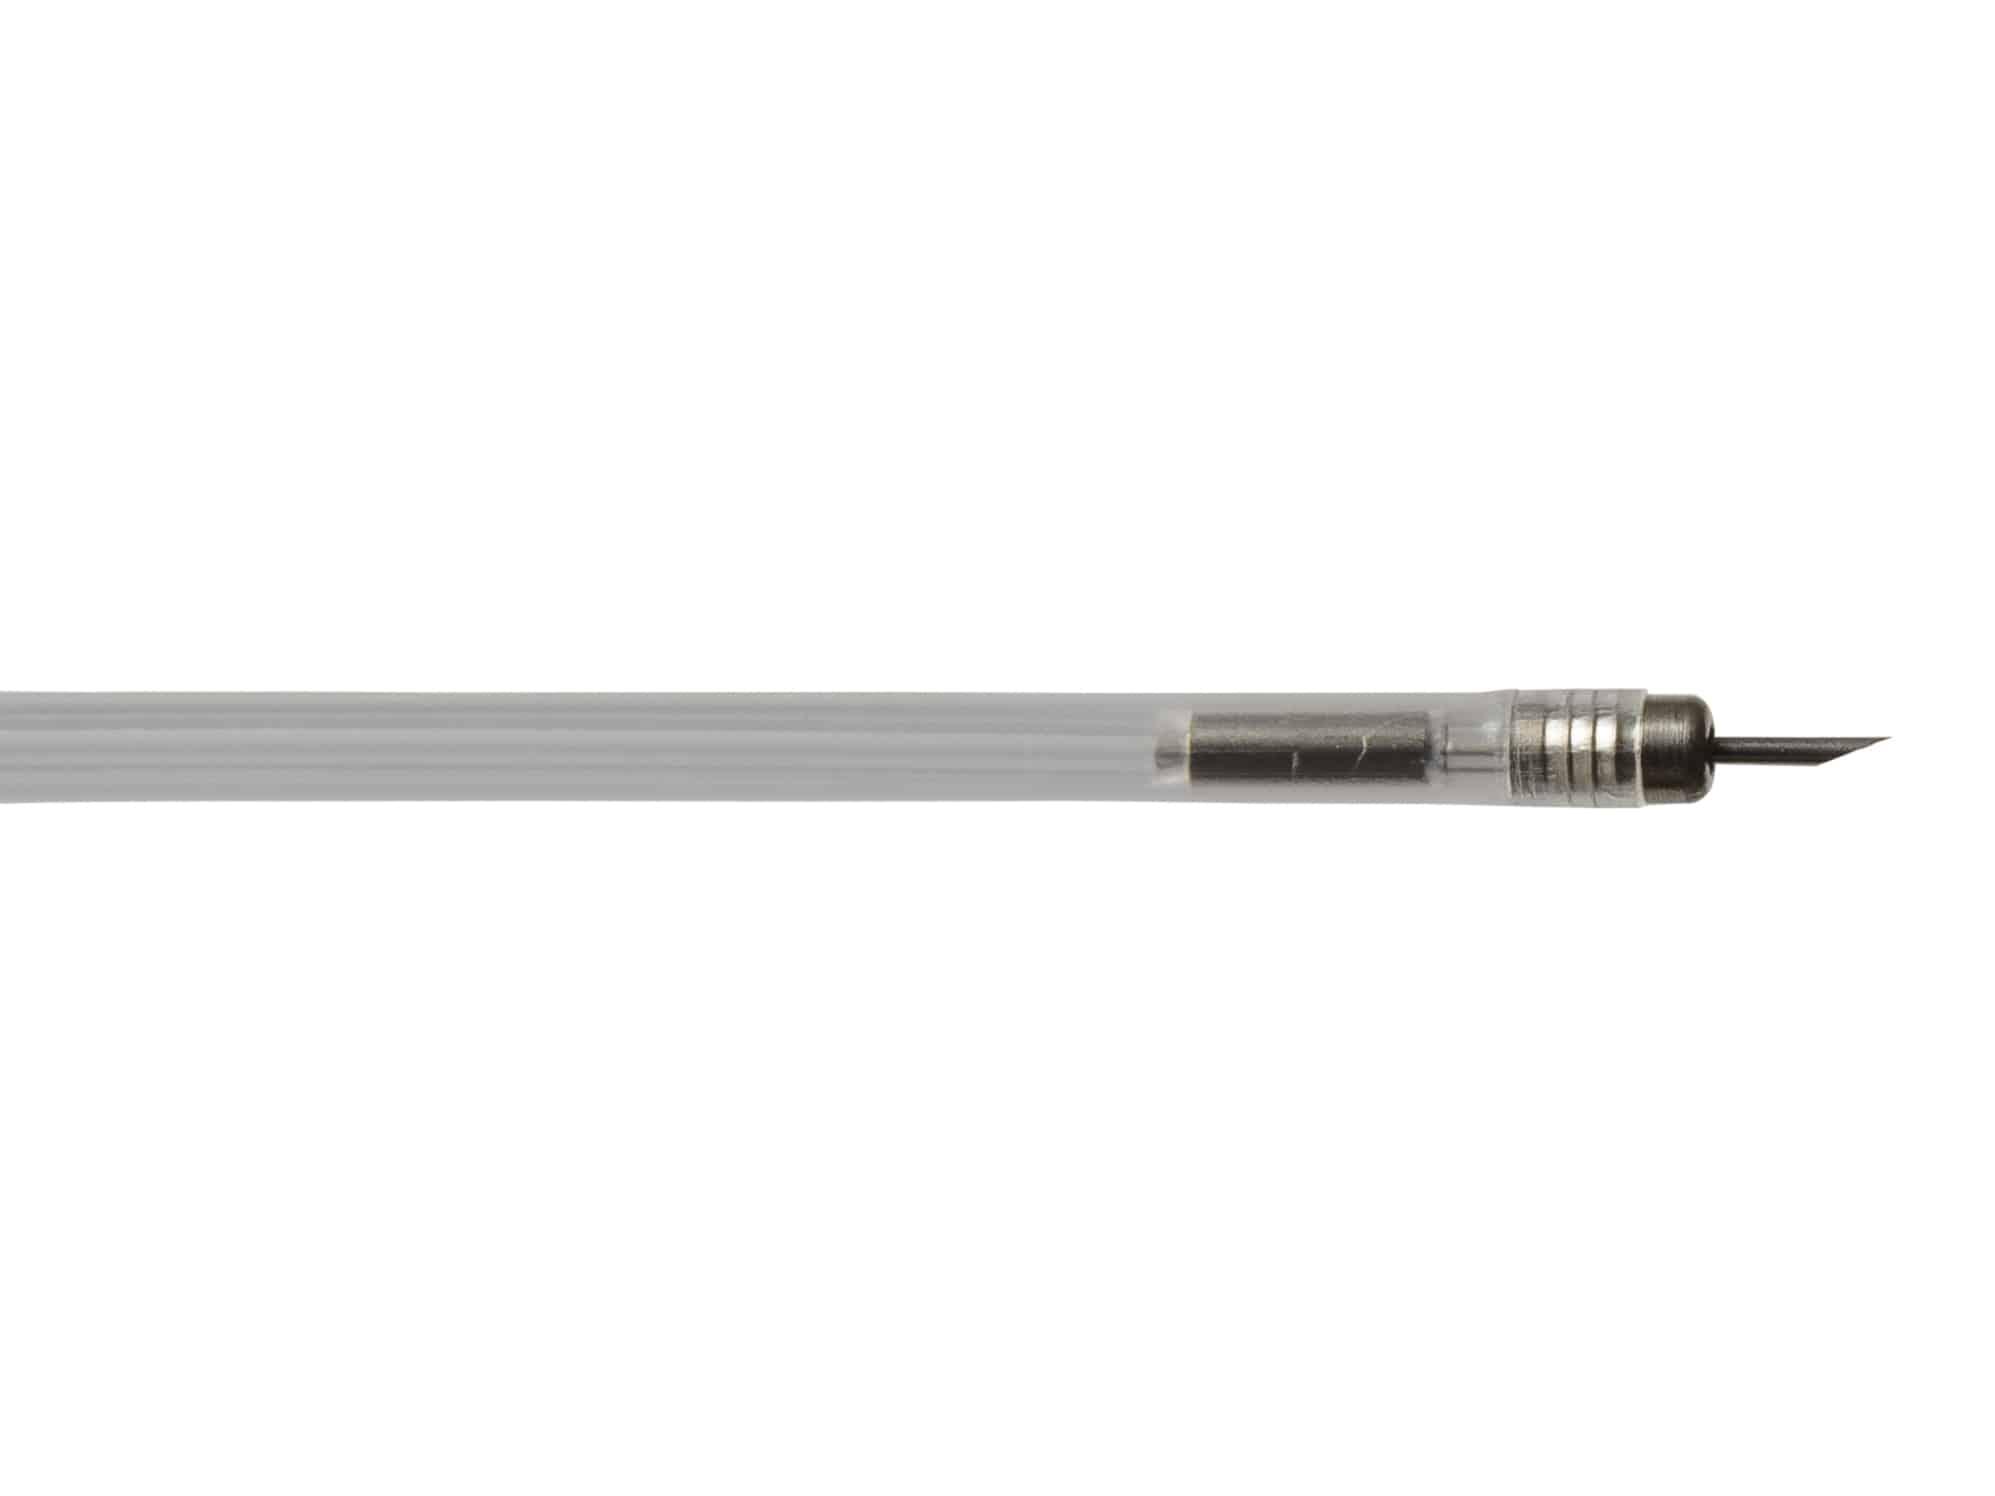 Ecoclick 23ga Series 2 Needle